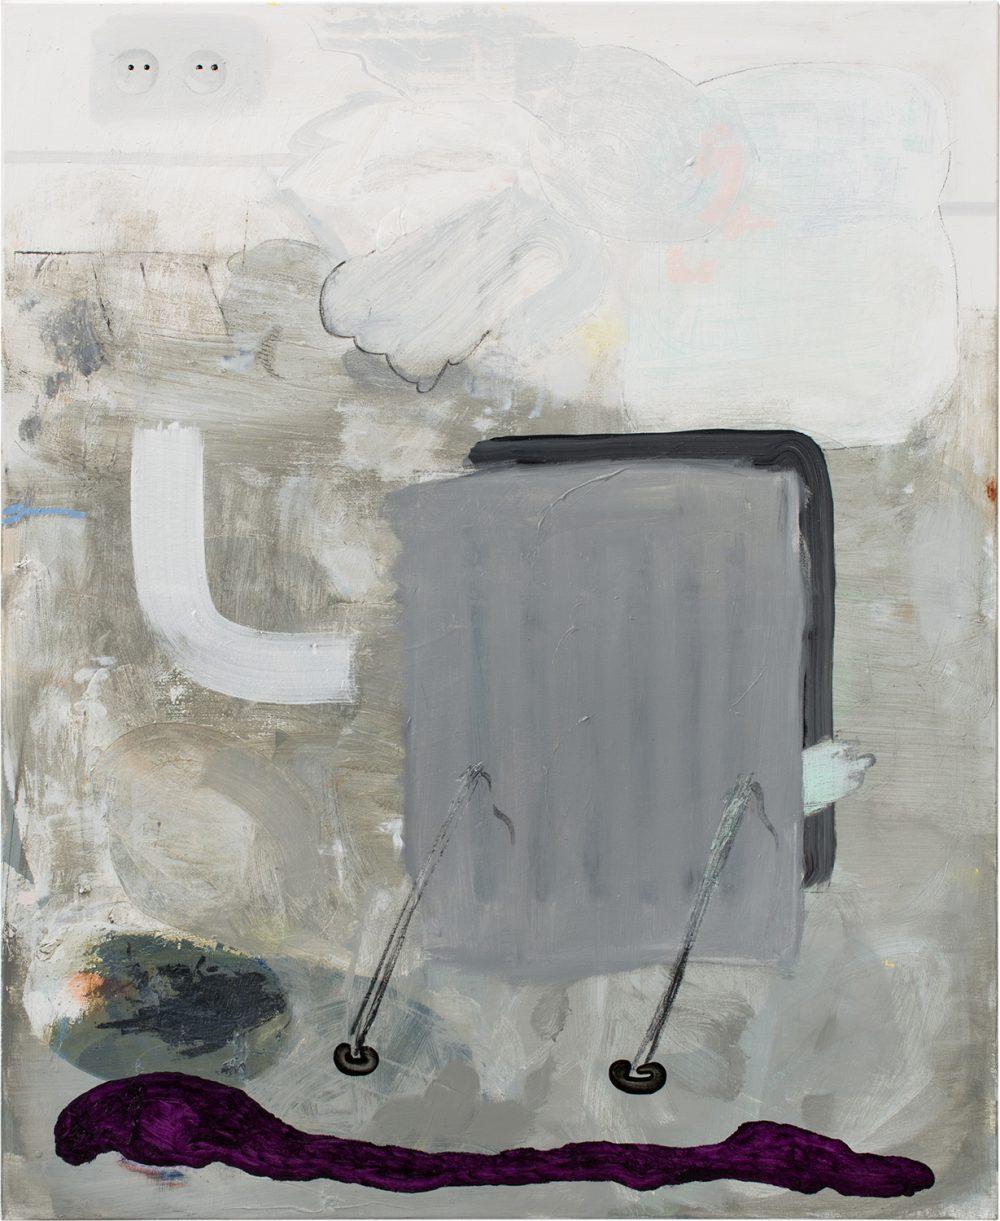 o.T. 59 (2017), Öl, Lack, Kohle auf Leinwand, 140 x 115 cm